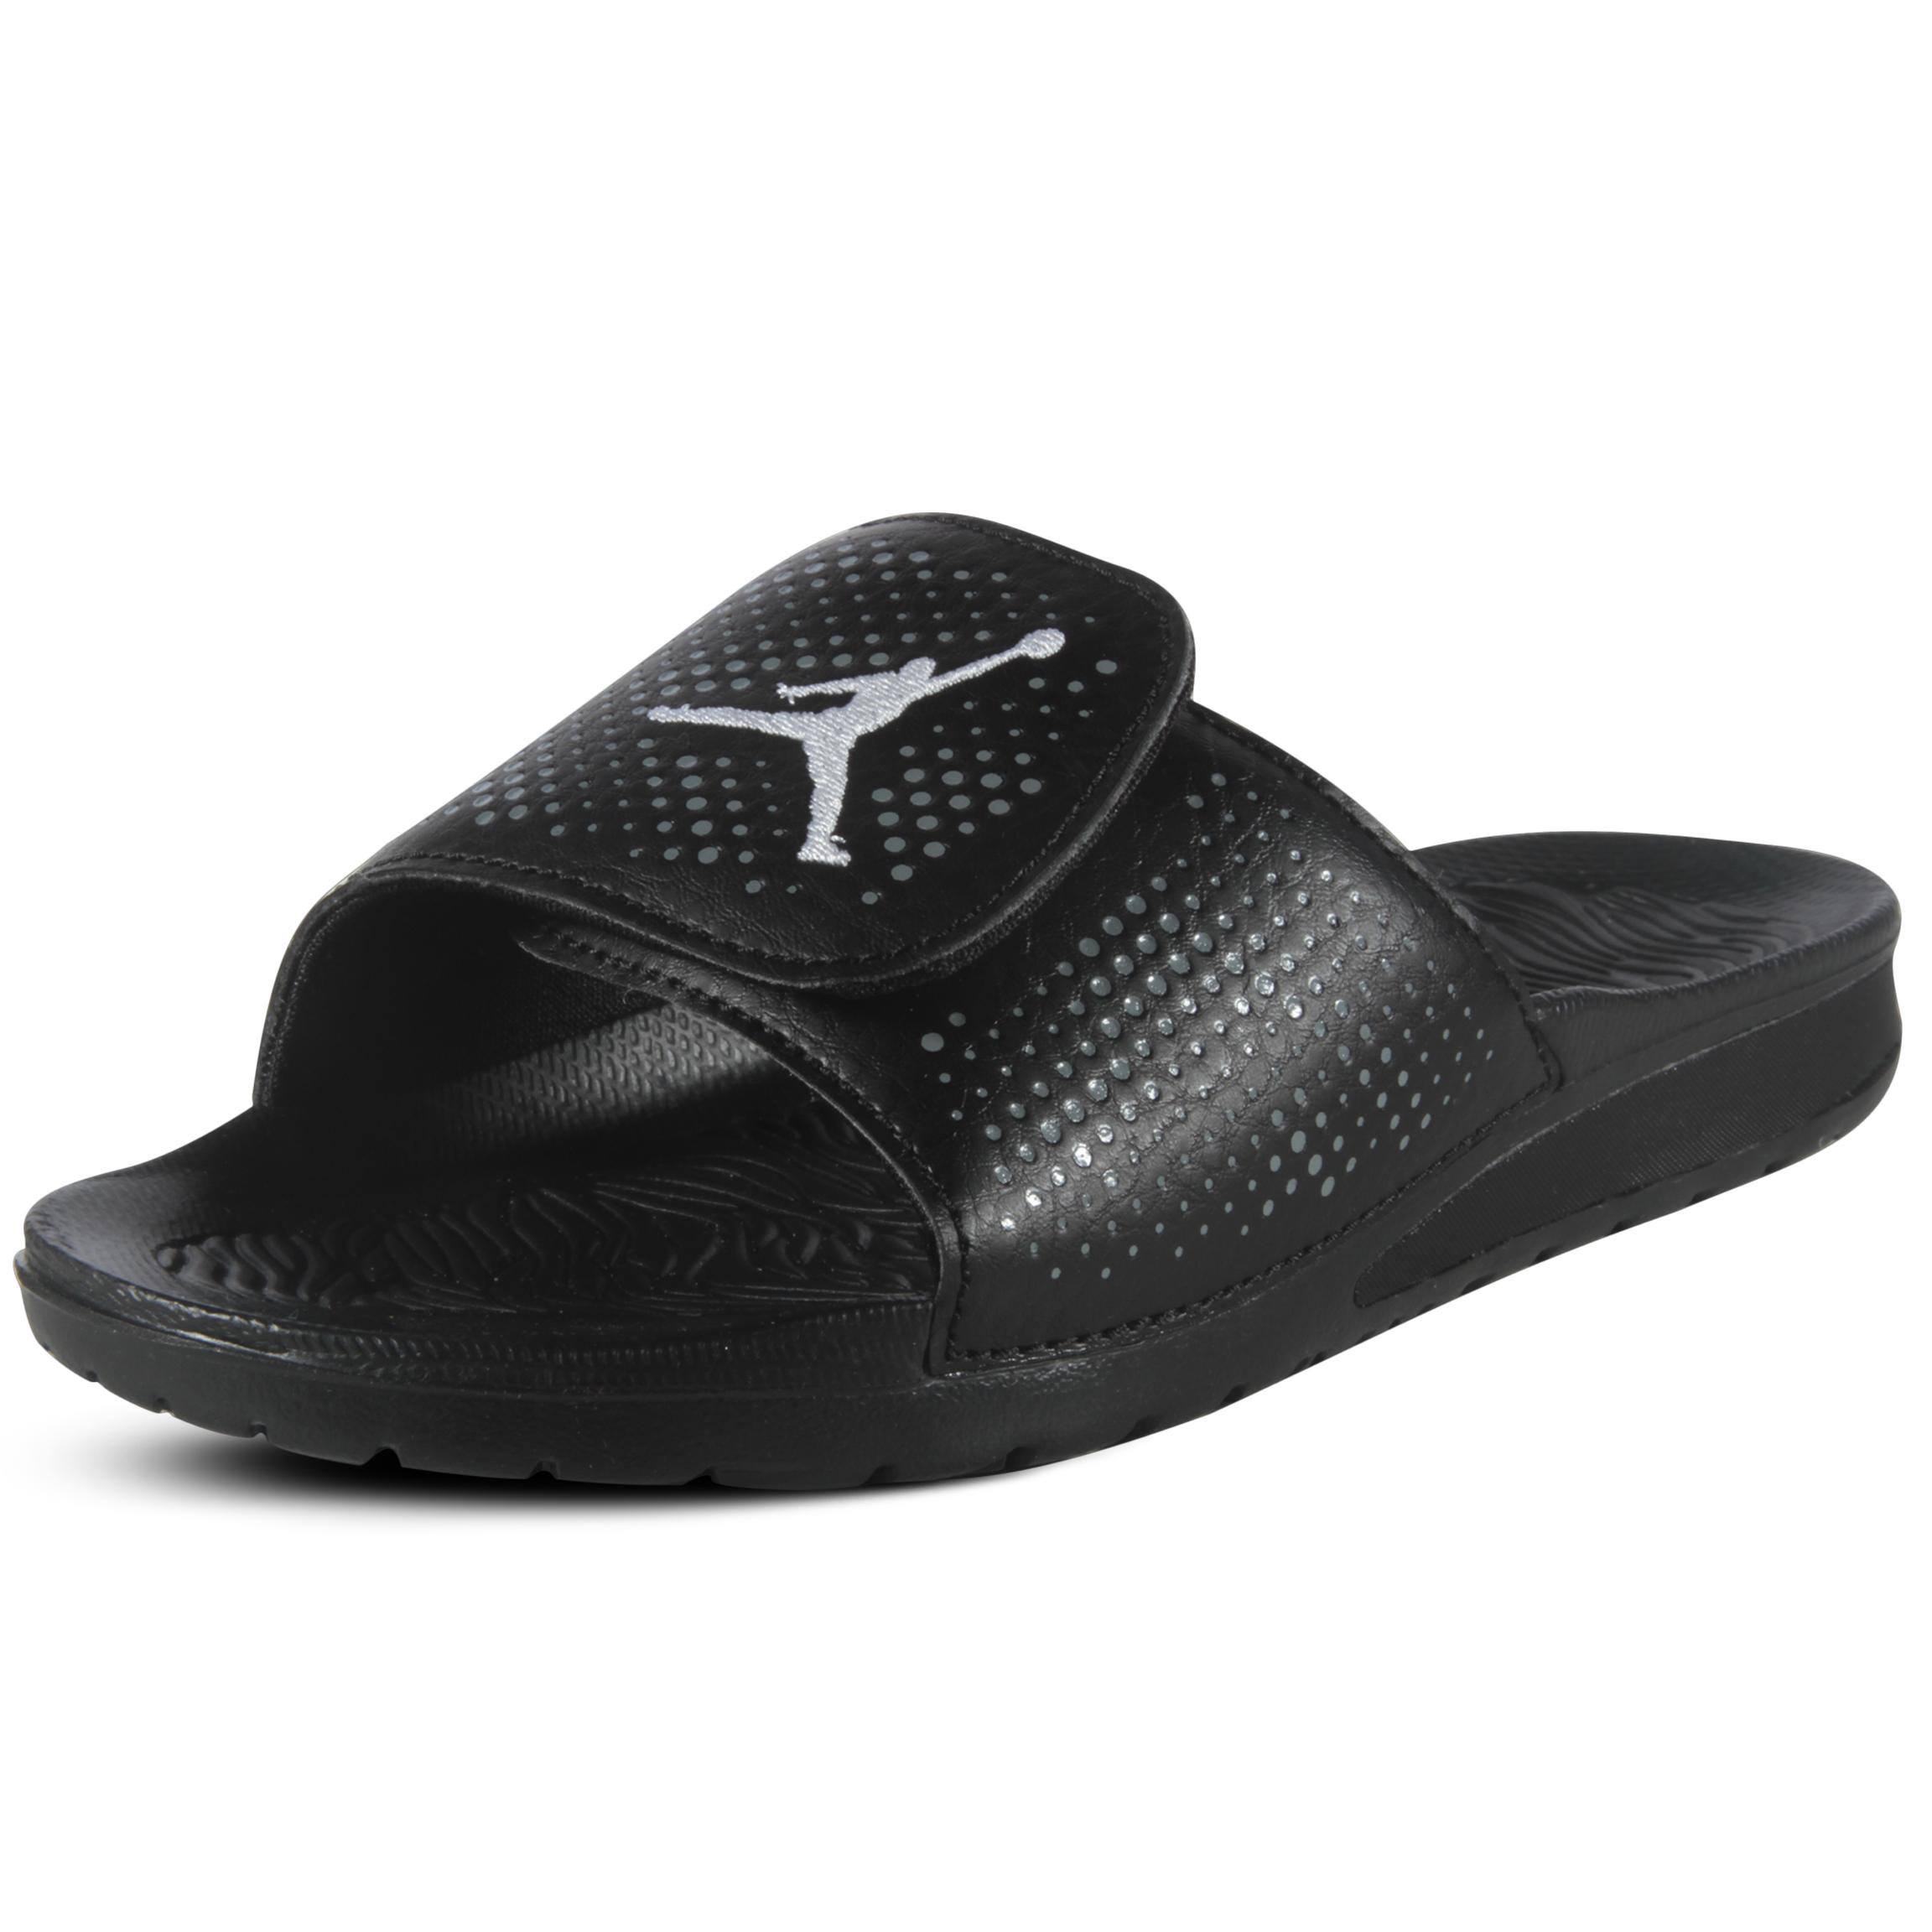 d8ef5cd0d992d1 Boy s Jordan Hydro 5 BP Pre-School (Little Kids) Sandals 820259-010 ...